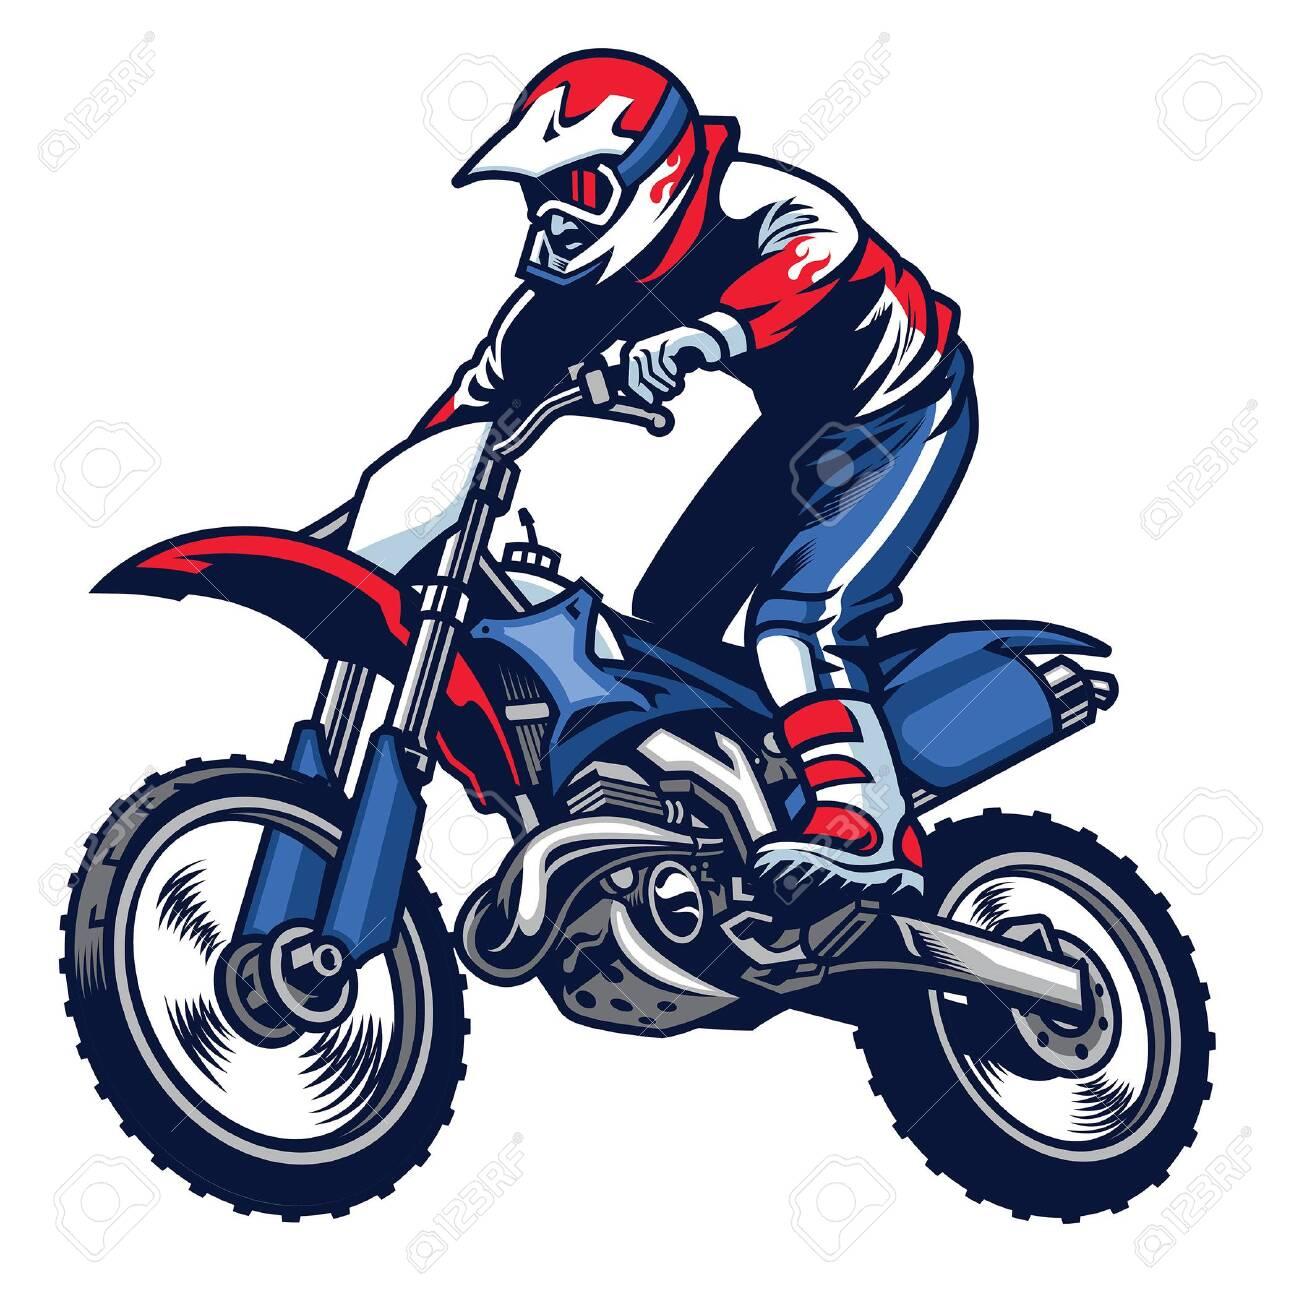 jumping motocross race - 132478596